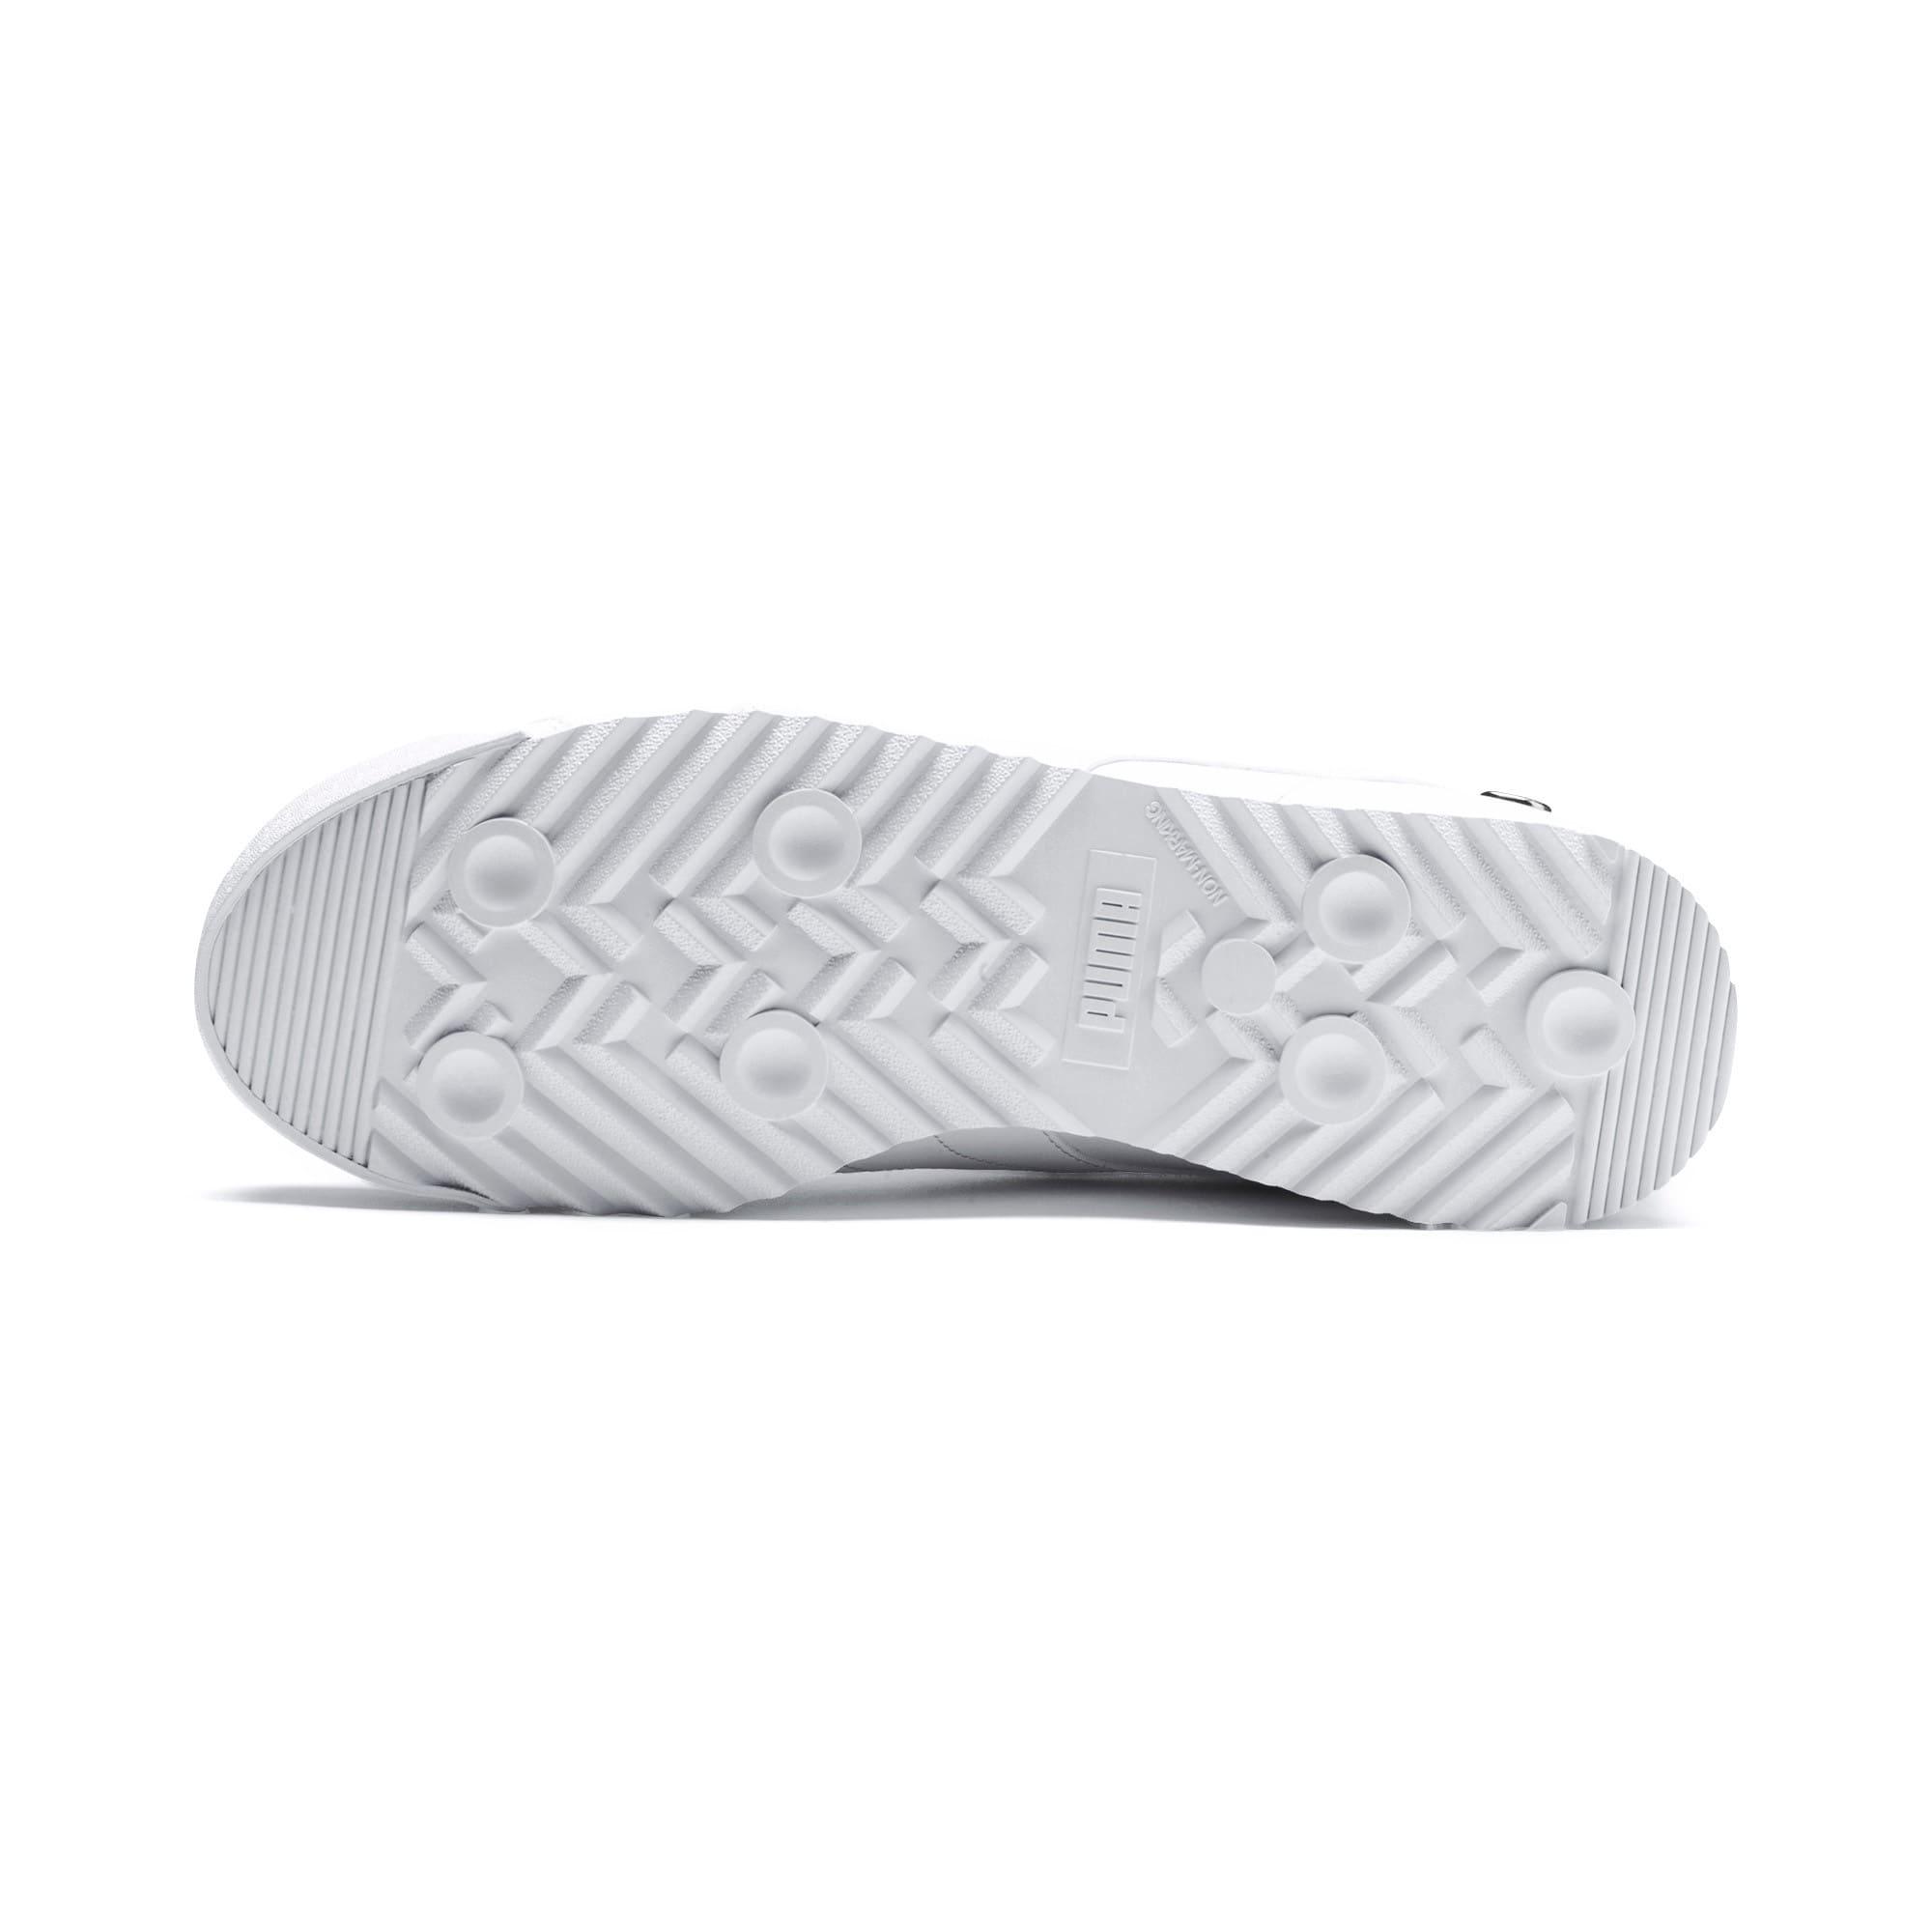 Thumbnail 4 of BMW M Motorsport Roma Men's Sneakers, Puma White-Puma White, medium